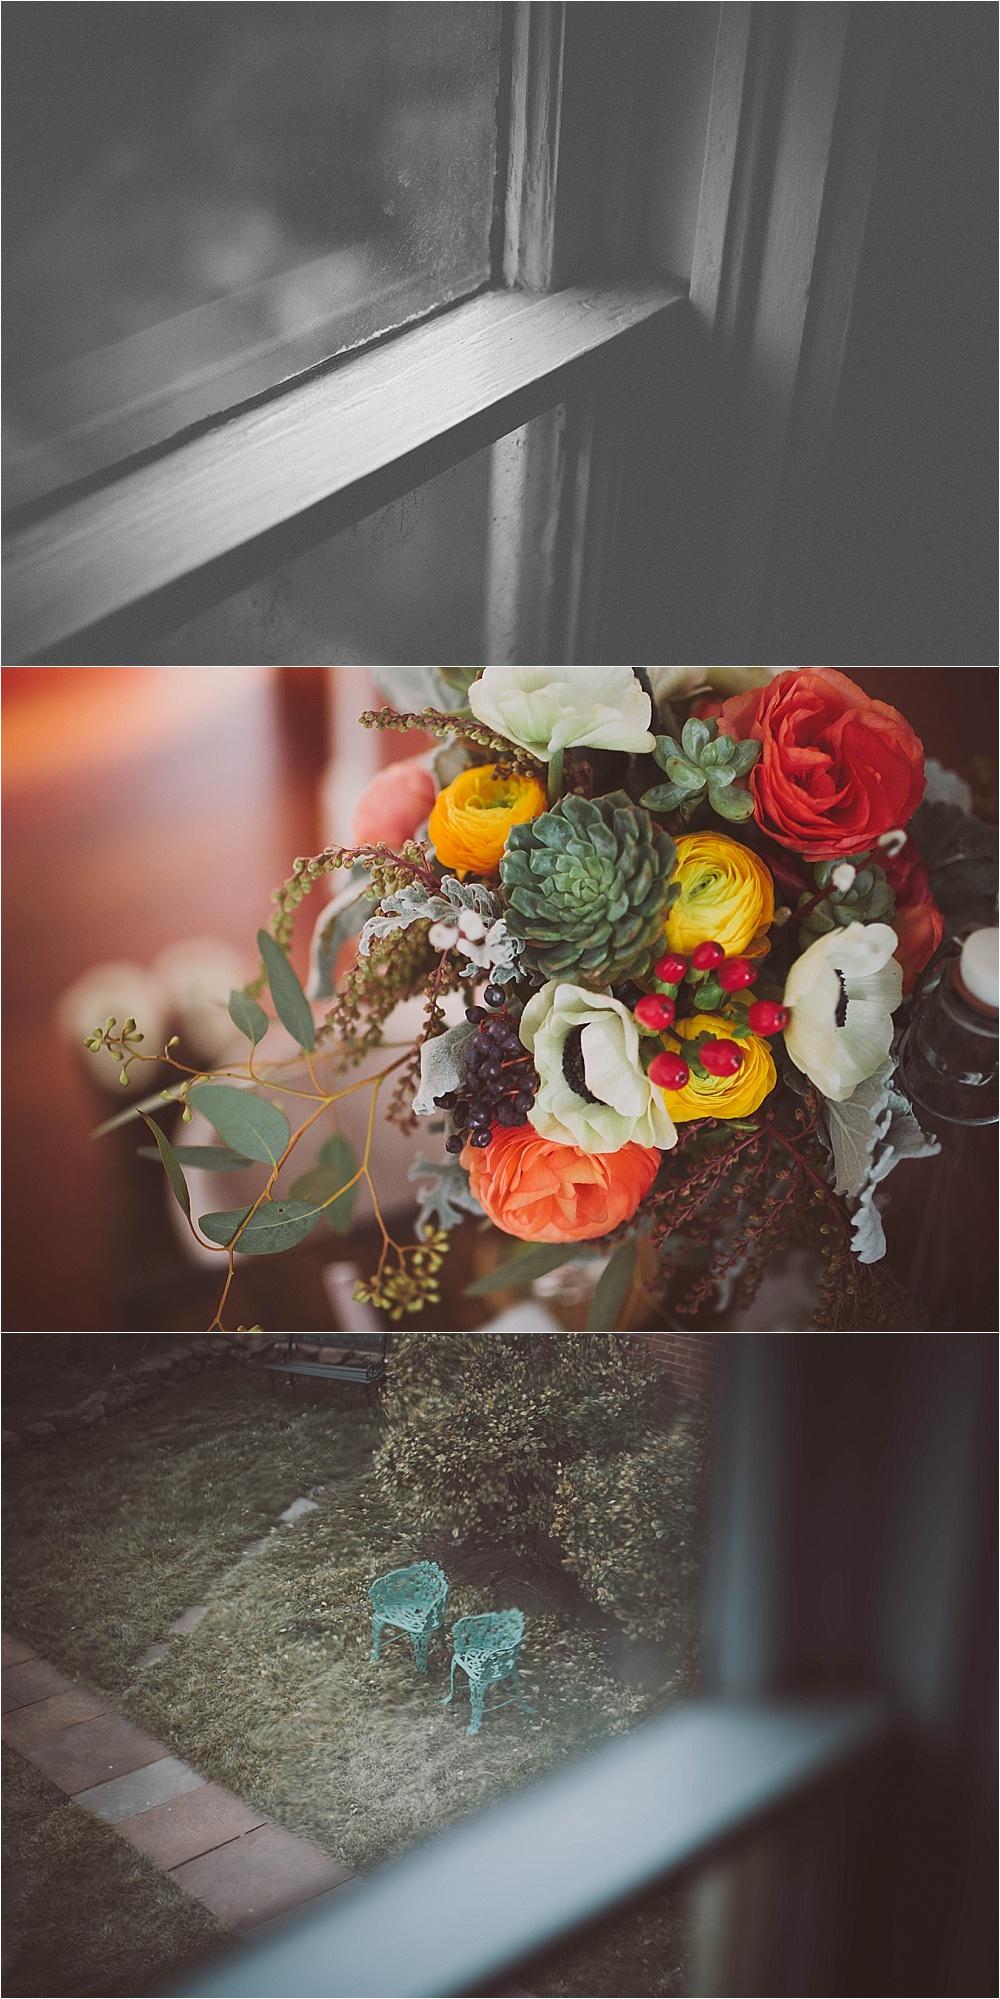 manzanita photo by rebecca caridad wedding lifestlye photography floral design calligraphy_1190.jpg